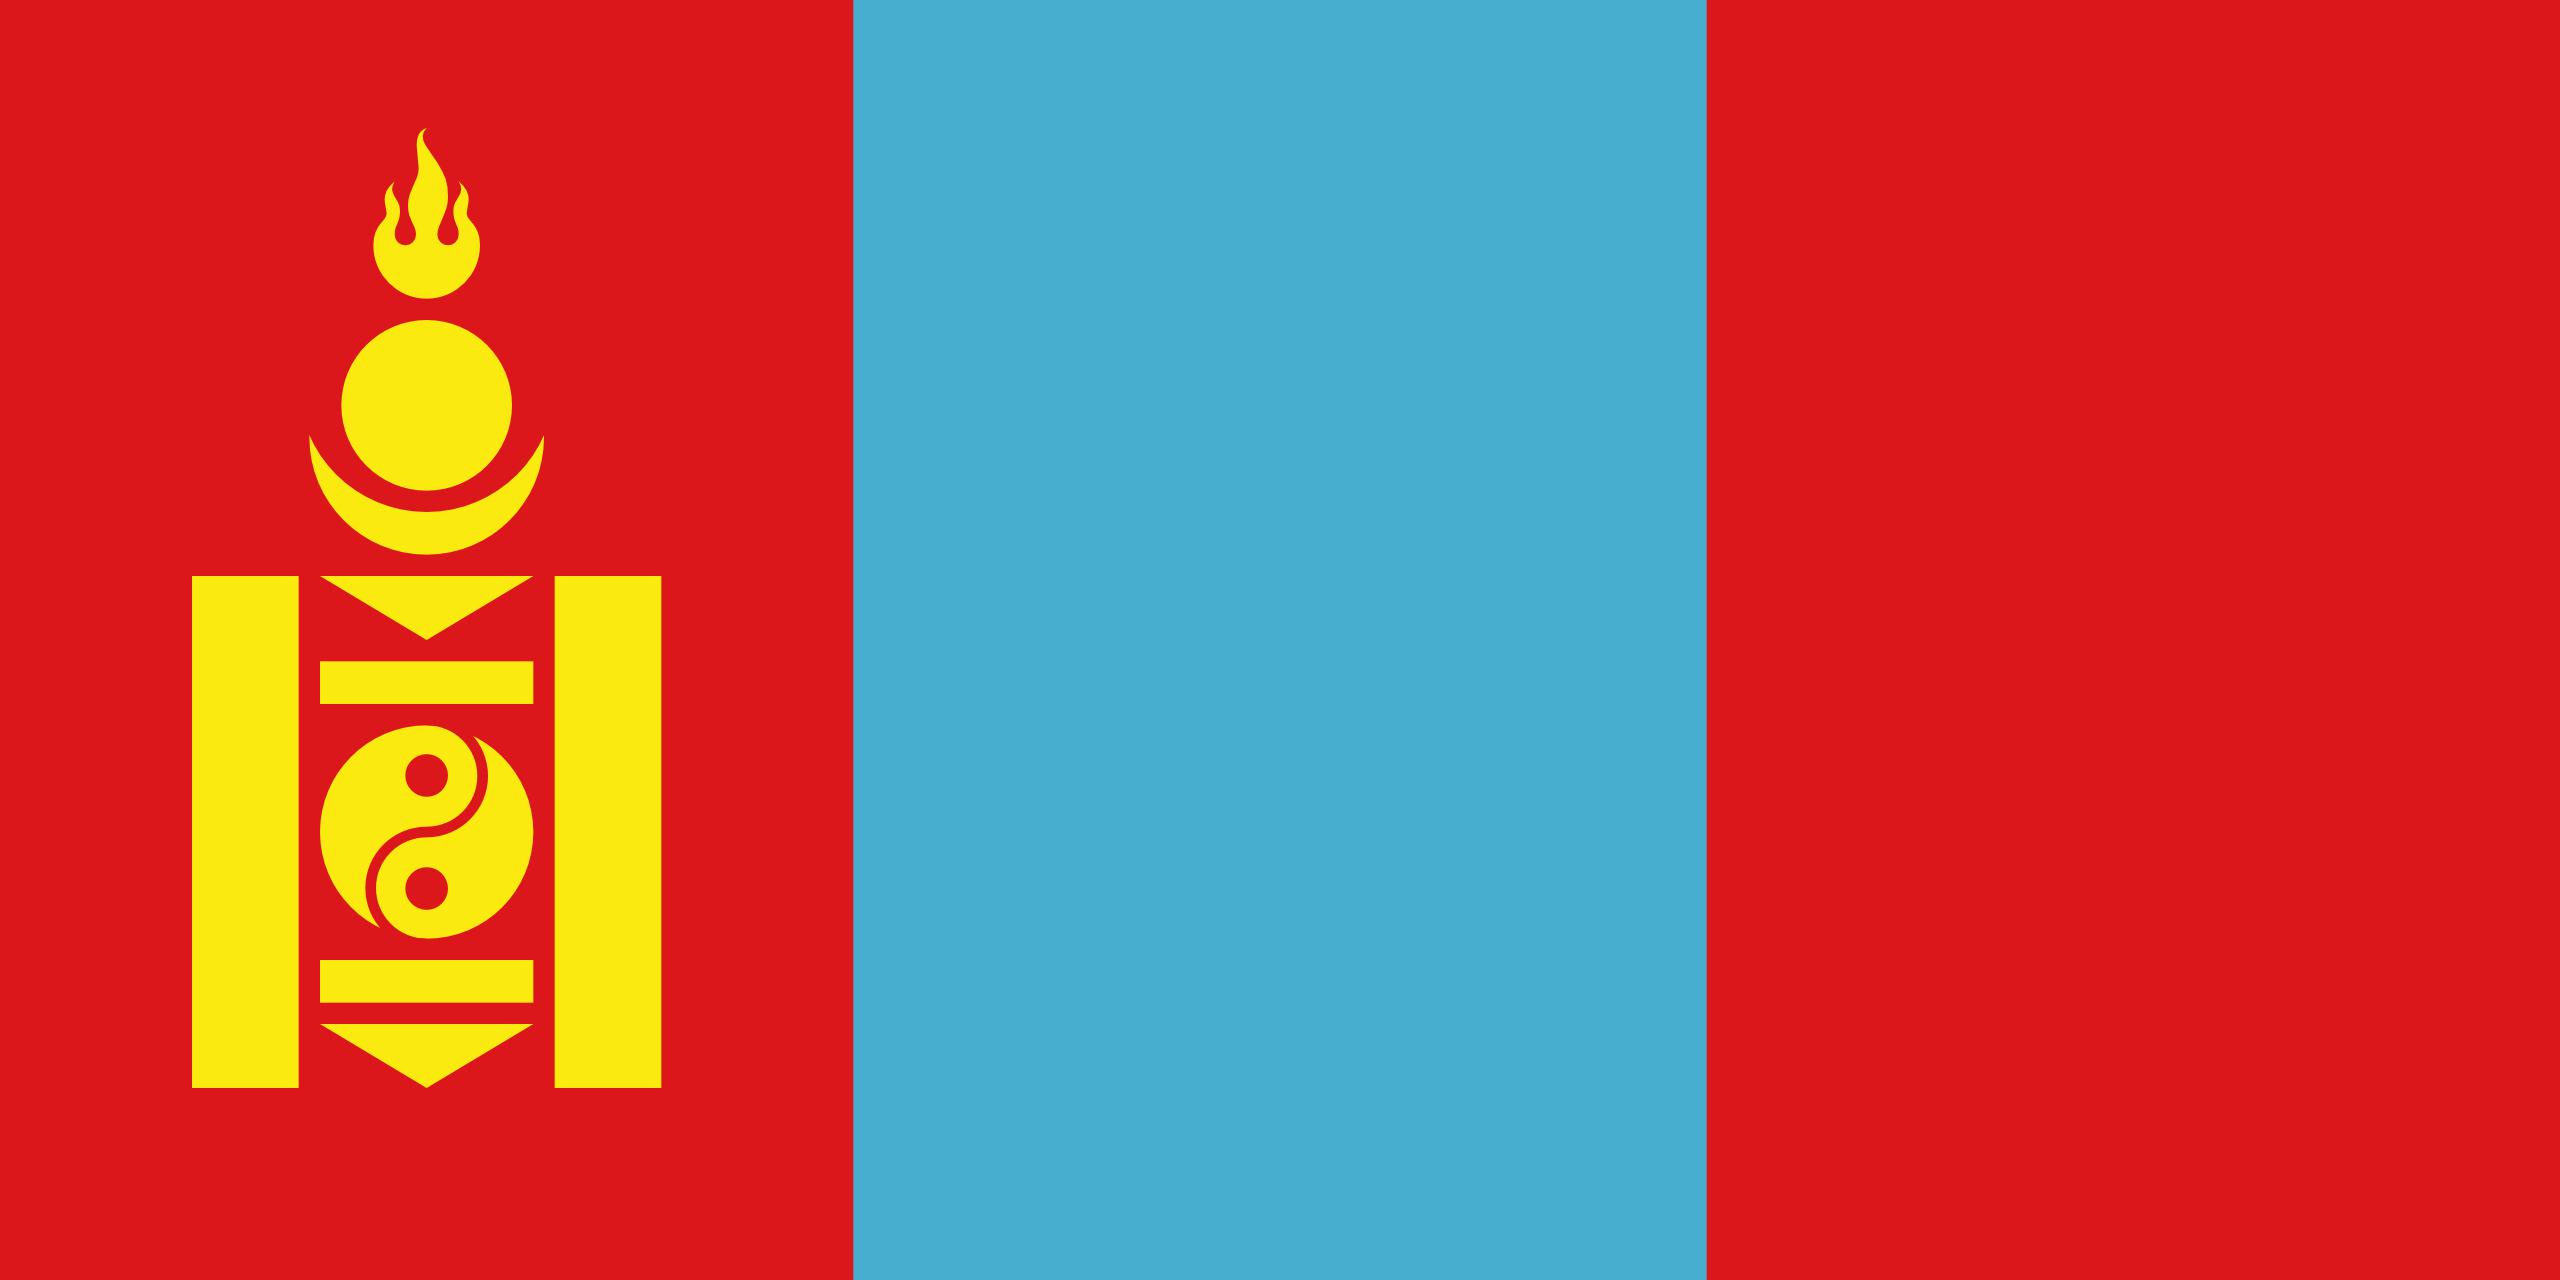 mongolia, 国家, 会徽, 徽标, 符号 - 高清壁纸 - 教授-falken.com